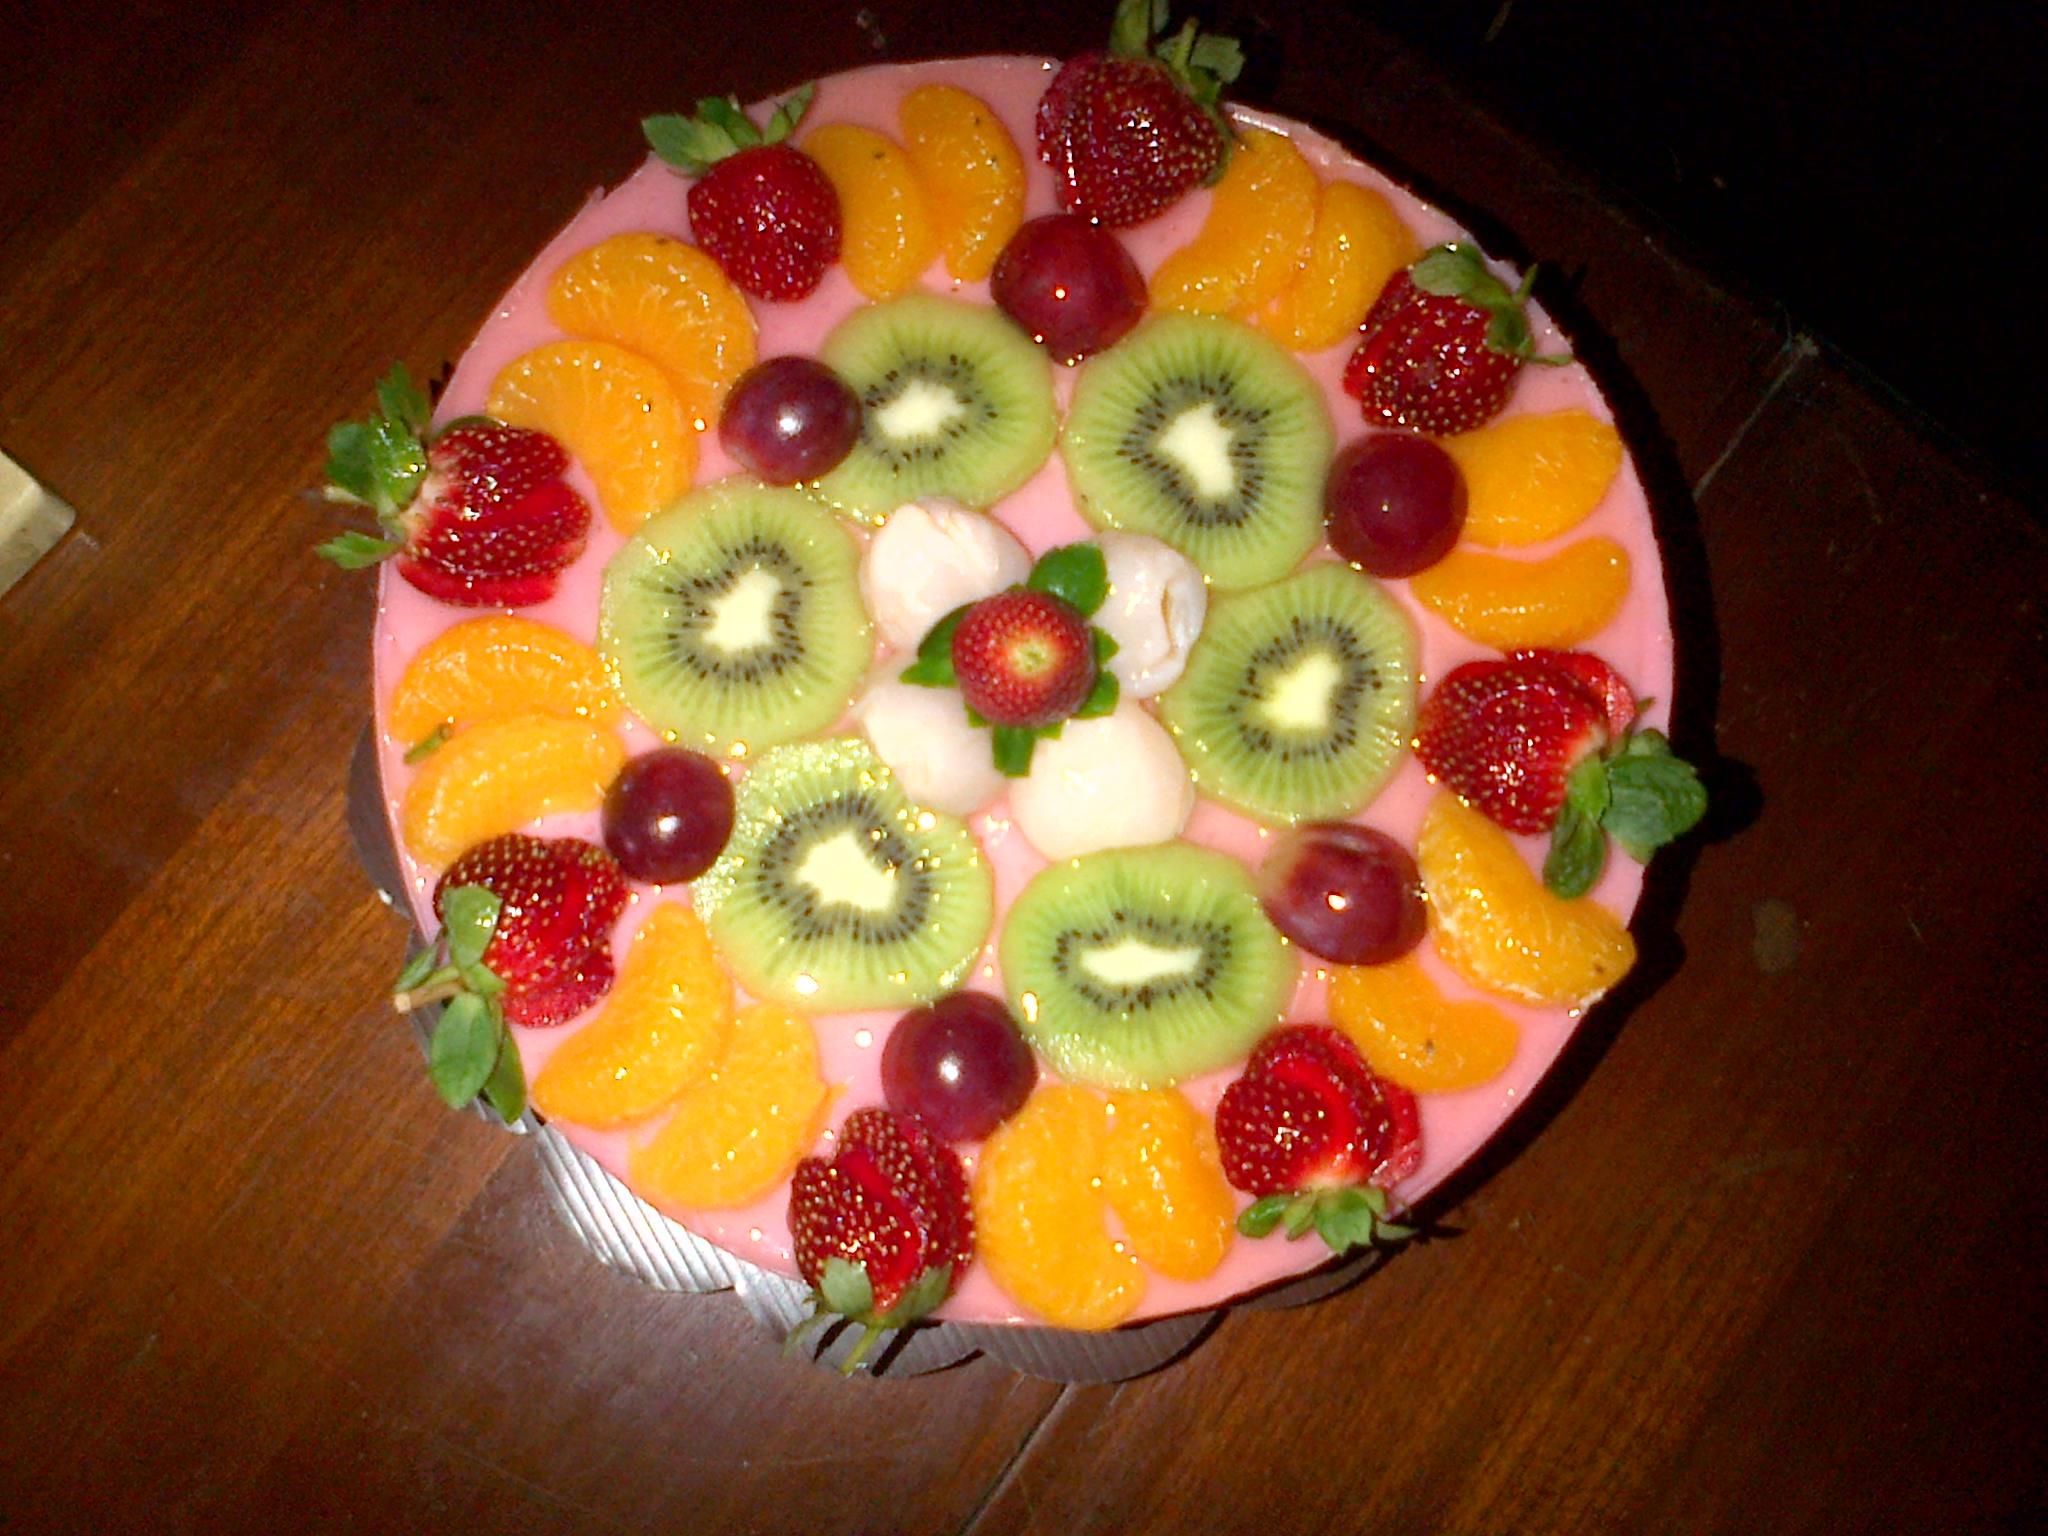 Jual Cake Pudding / Puding Cake Aneka Rasa di Jakarta – Hub Ibu Hedy